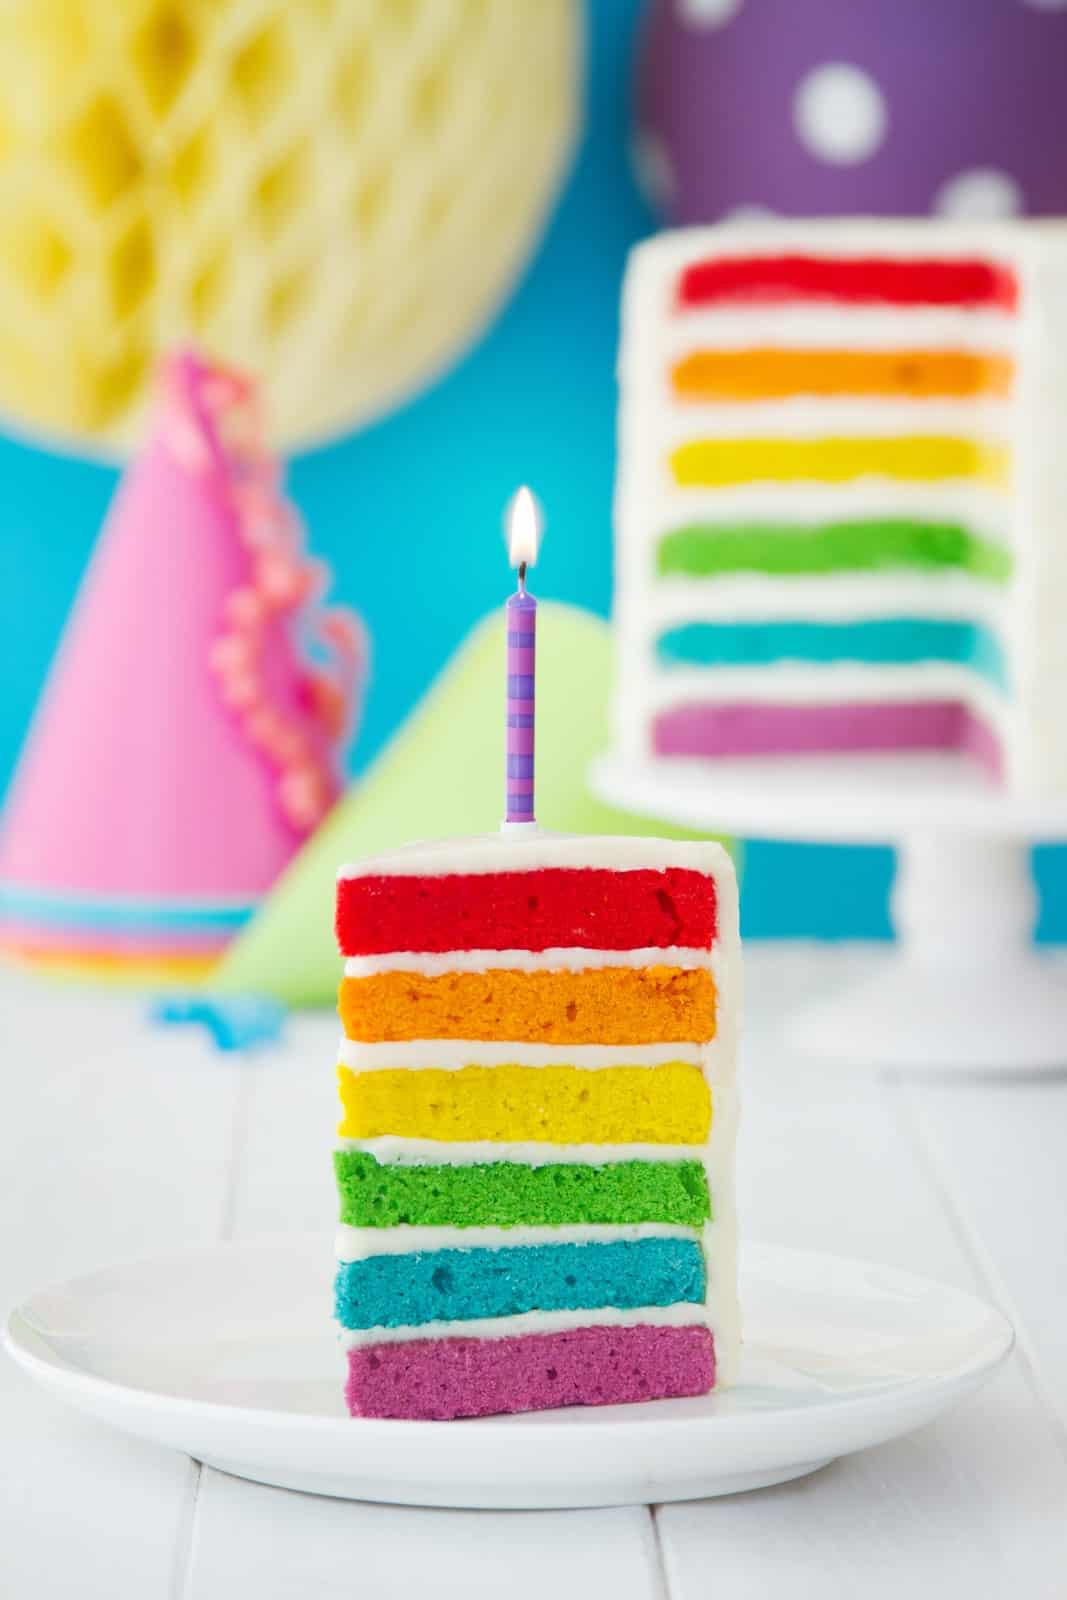 Canva - Colorful Slice of Rainbow Birthday Cake